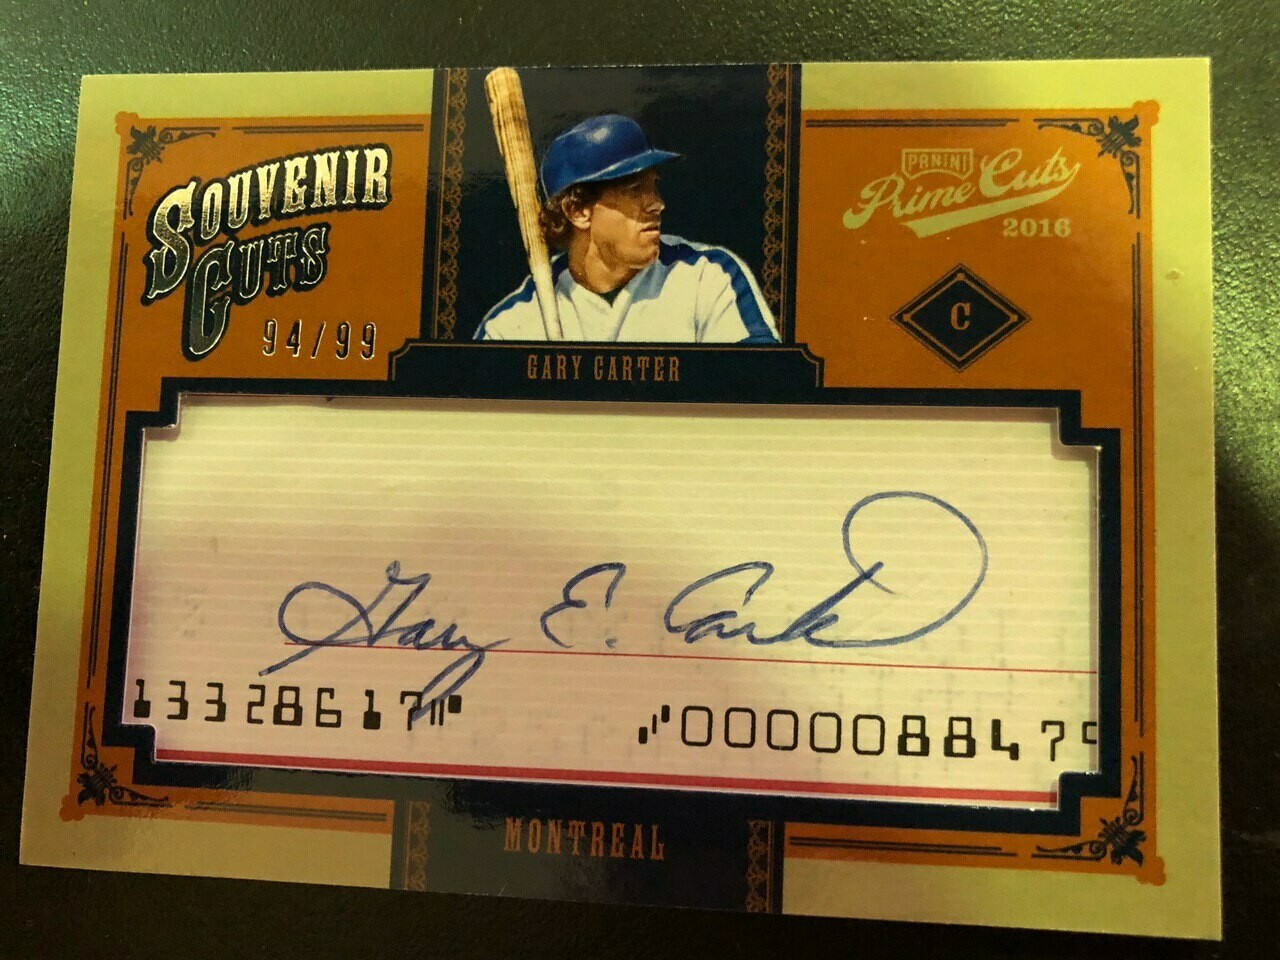 2016 Panini Souvenir Cuts Gary Carter Autograph card, $35